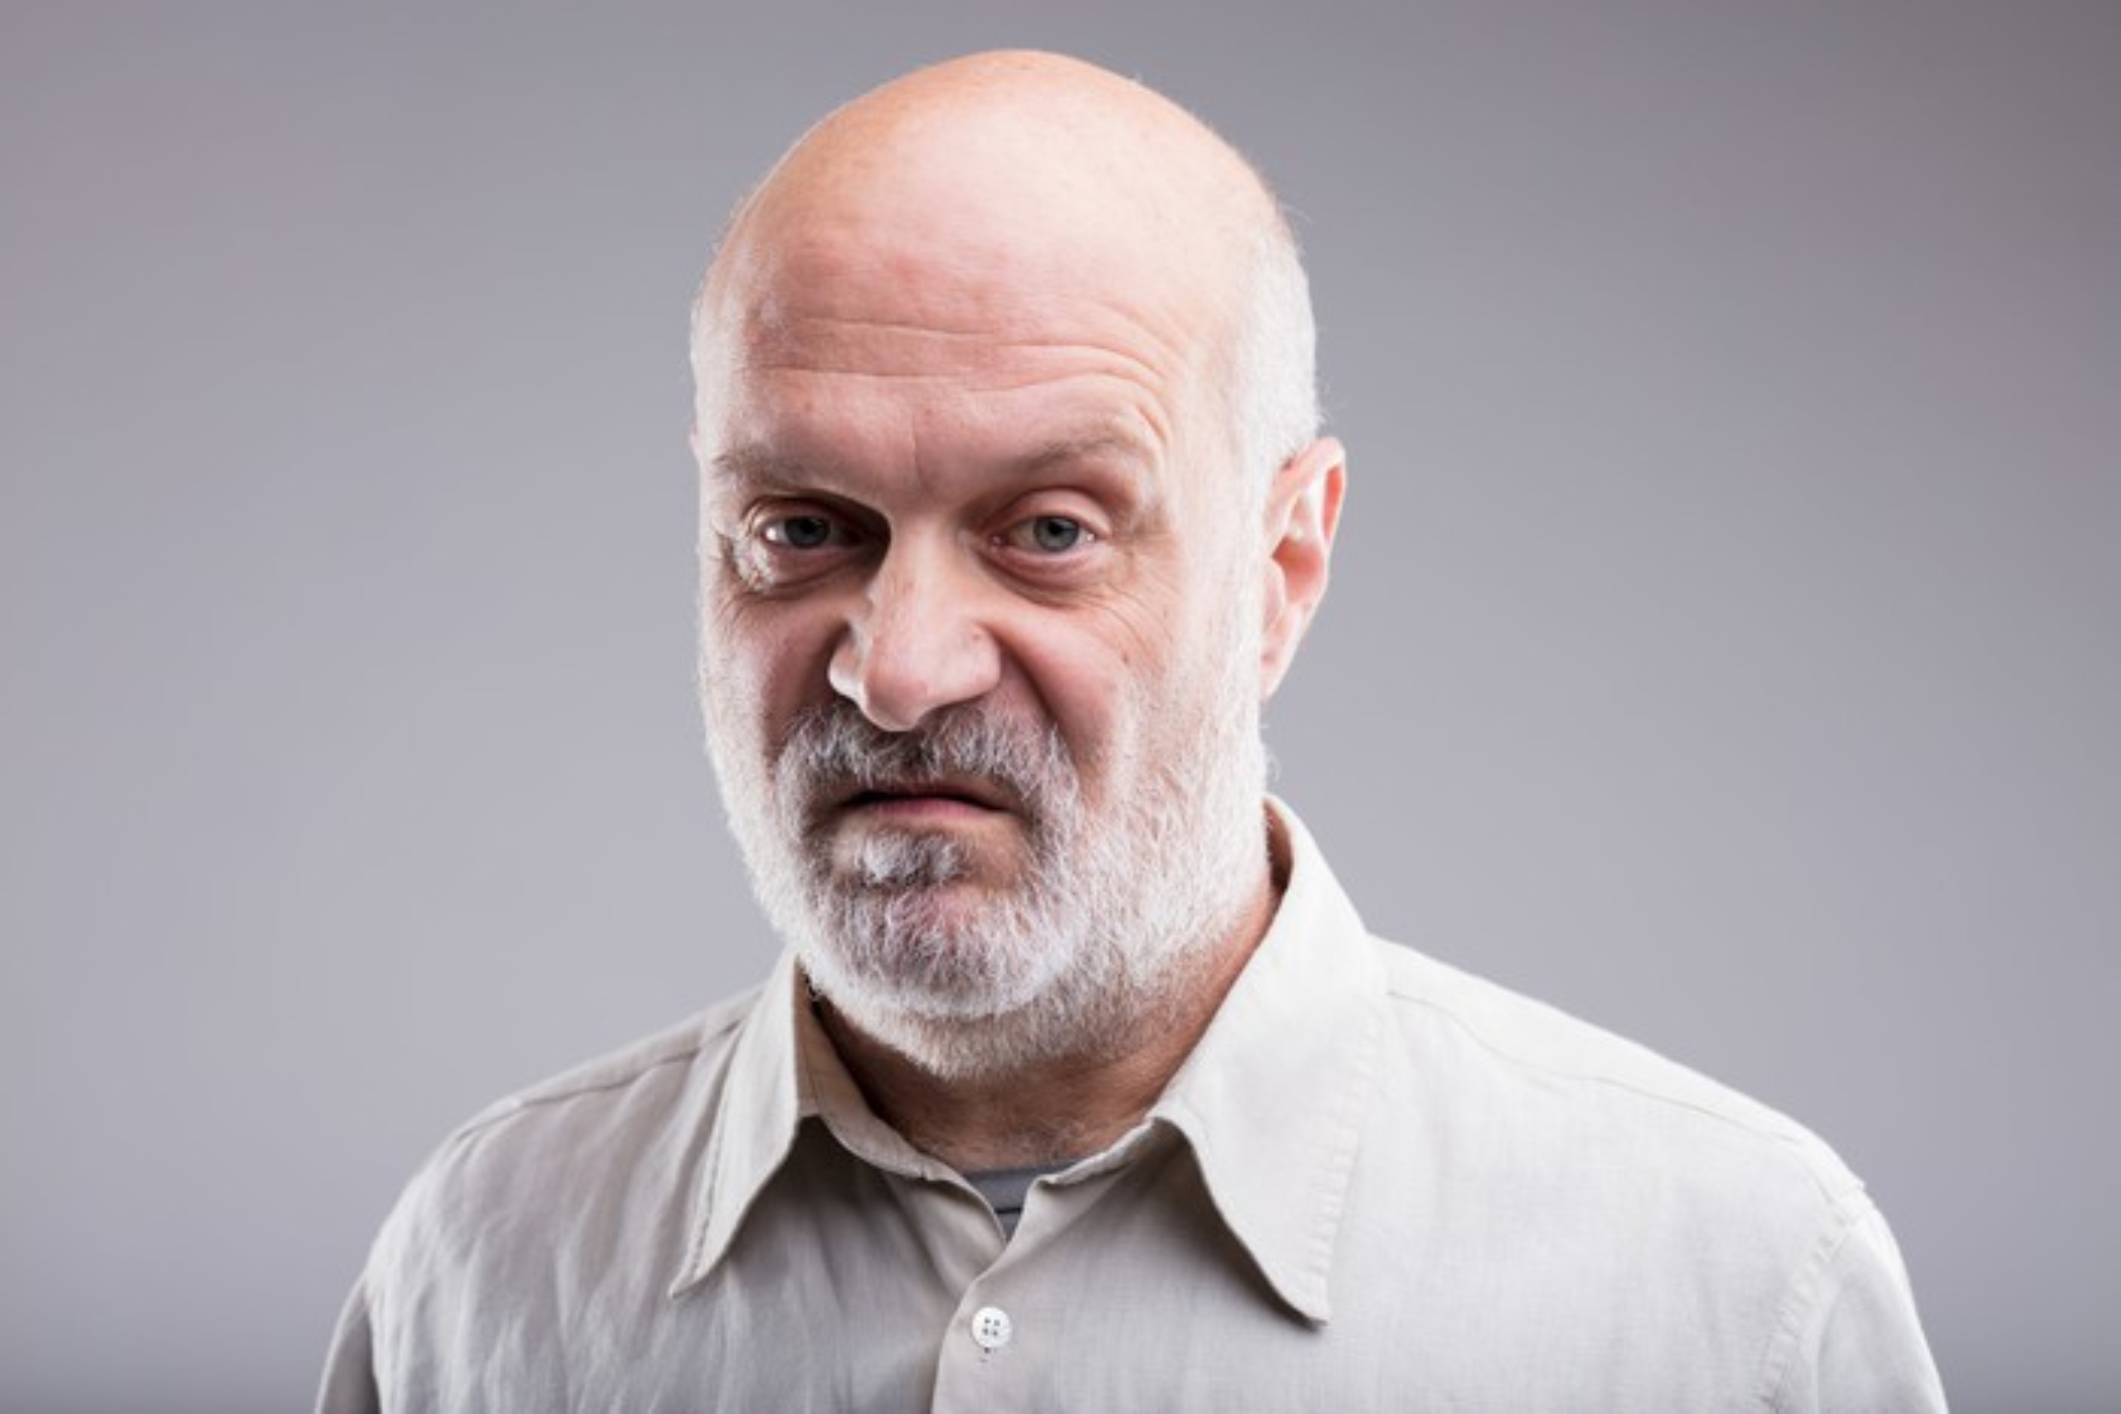 Older man scowling